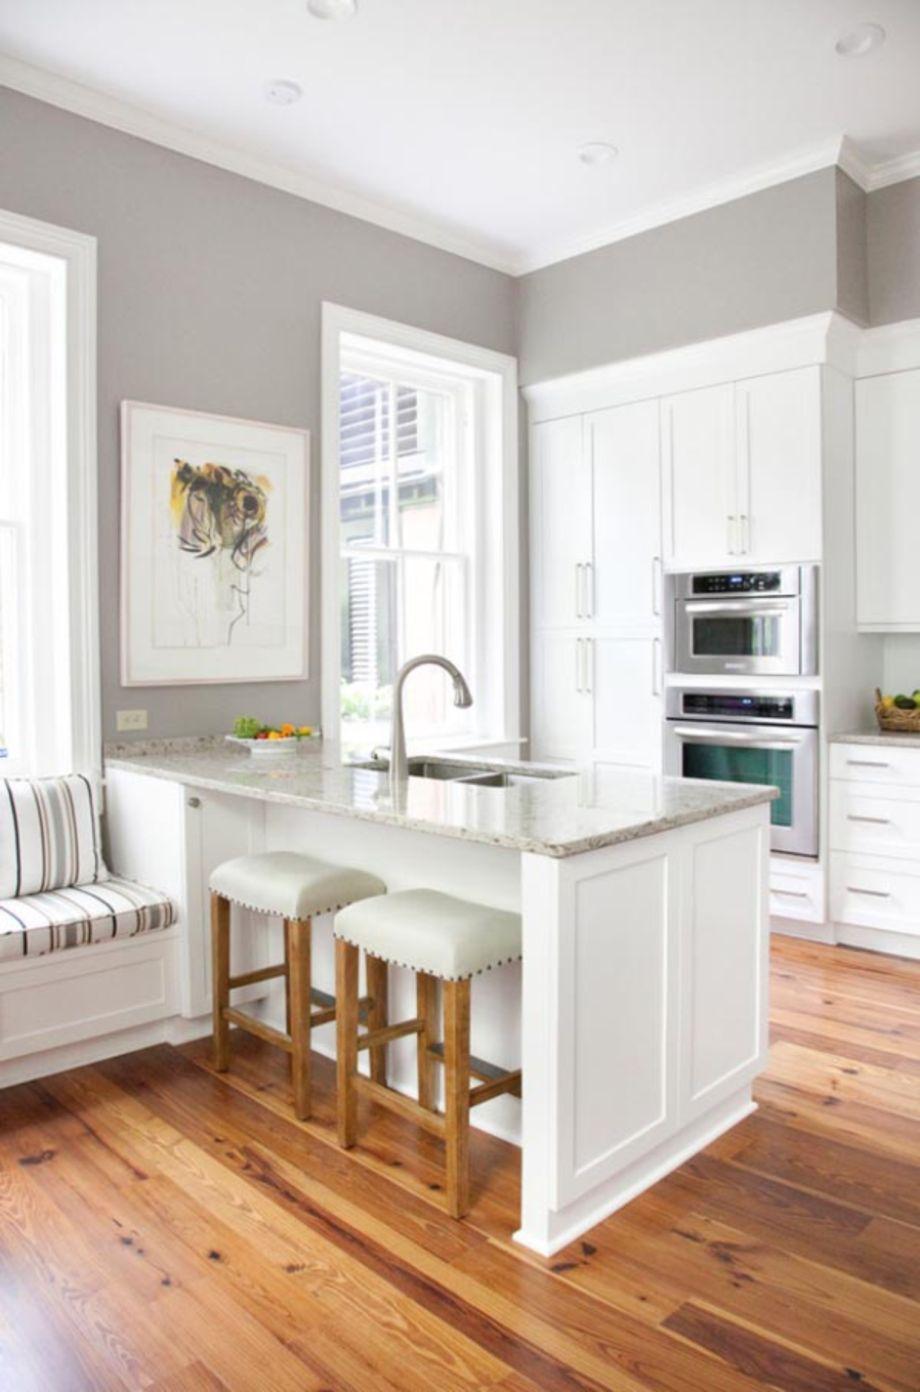 Beautiful Kitchen Design Ideas For Mobile Homes 17 Kitchen Design Small Kitchen Remodel Small Interior Design Kitchen